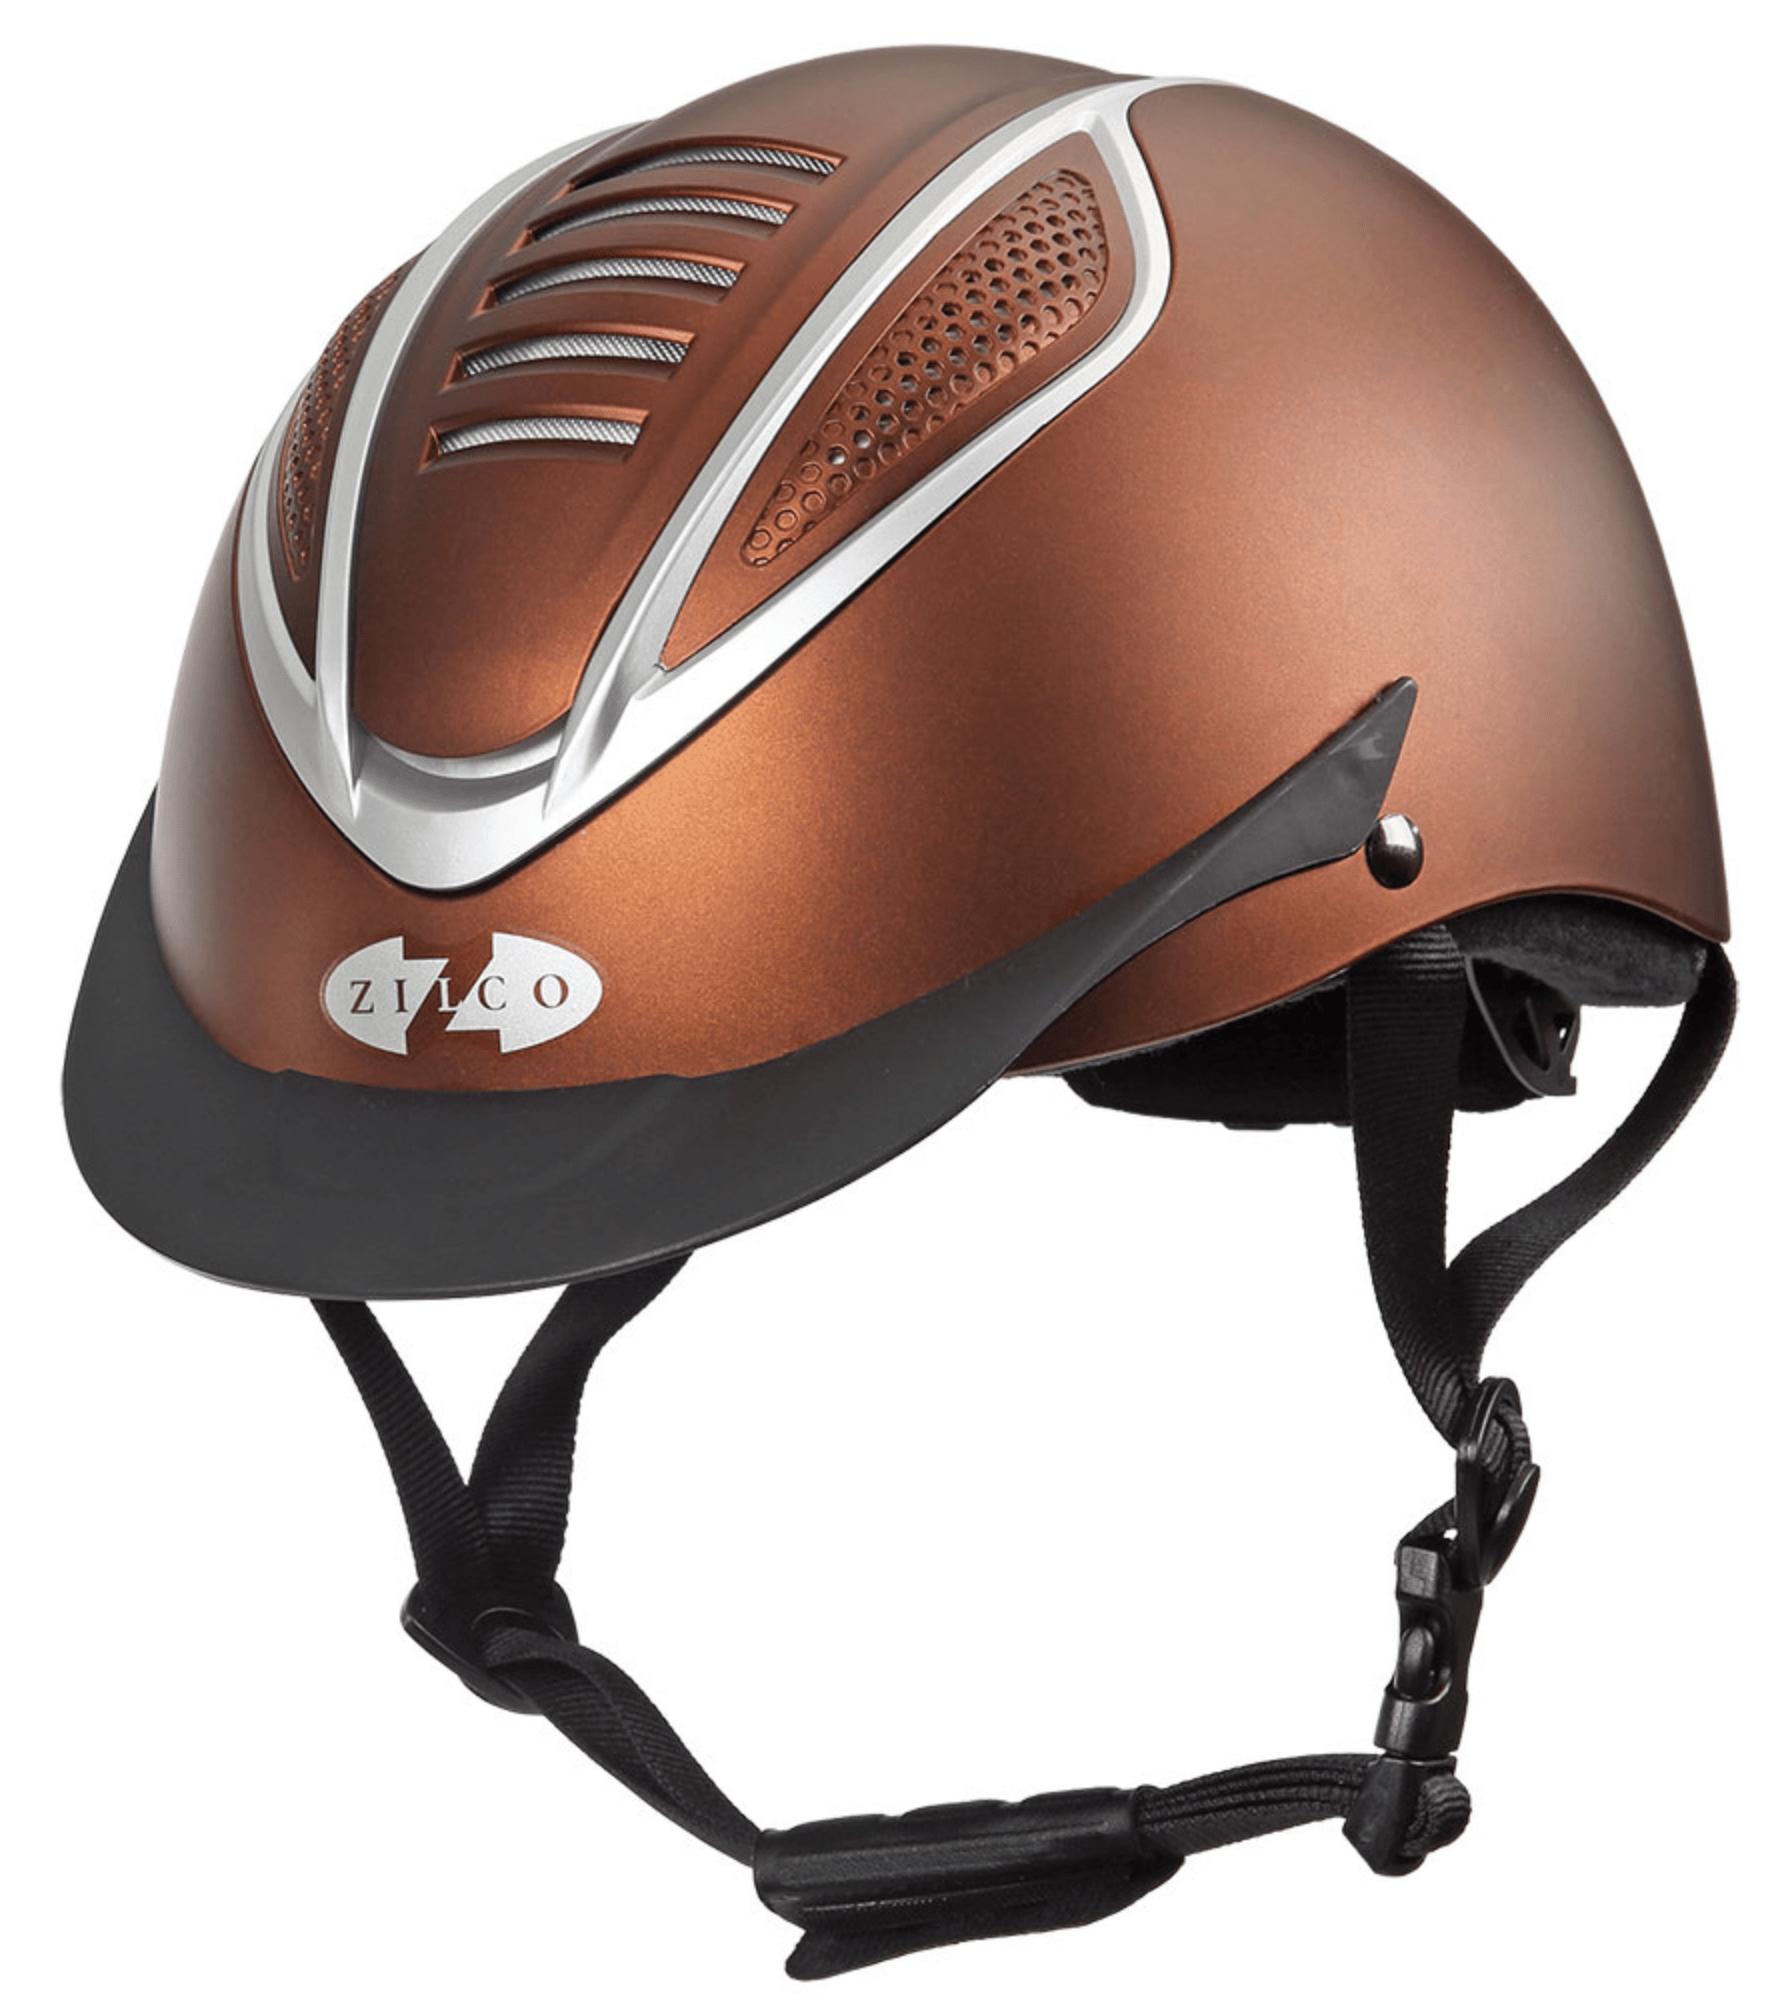 Oscar Riding Helmet Vibe Bronze Large at Bowral Coop